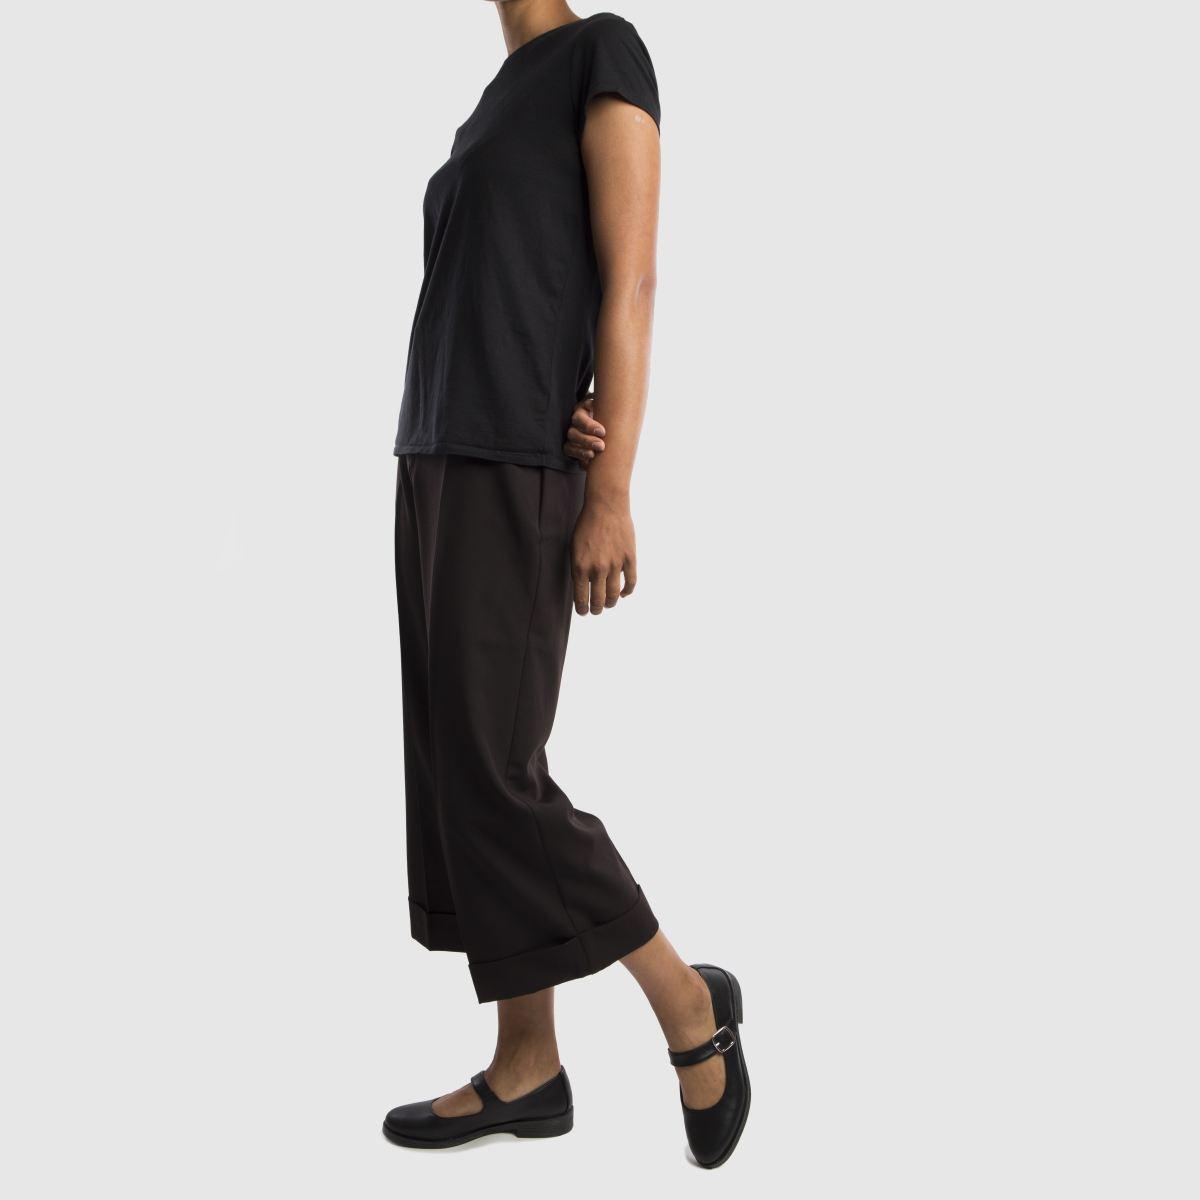 adidas Originals Varial Mid in schwarz CQ1150 | everysize